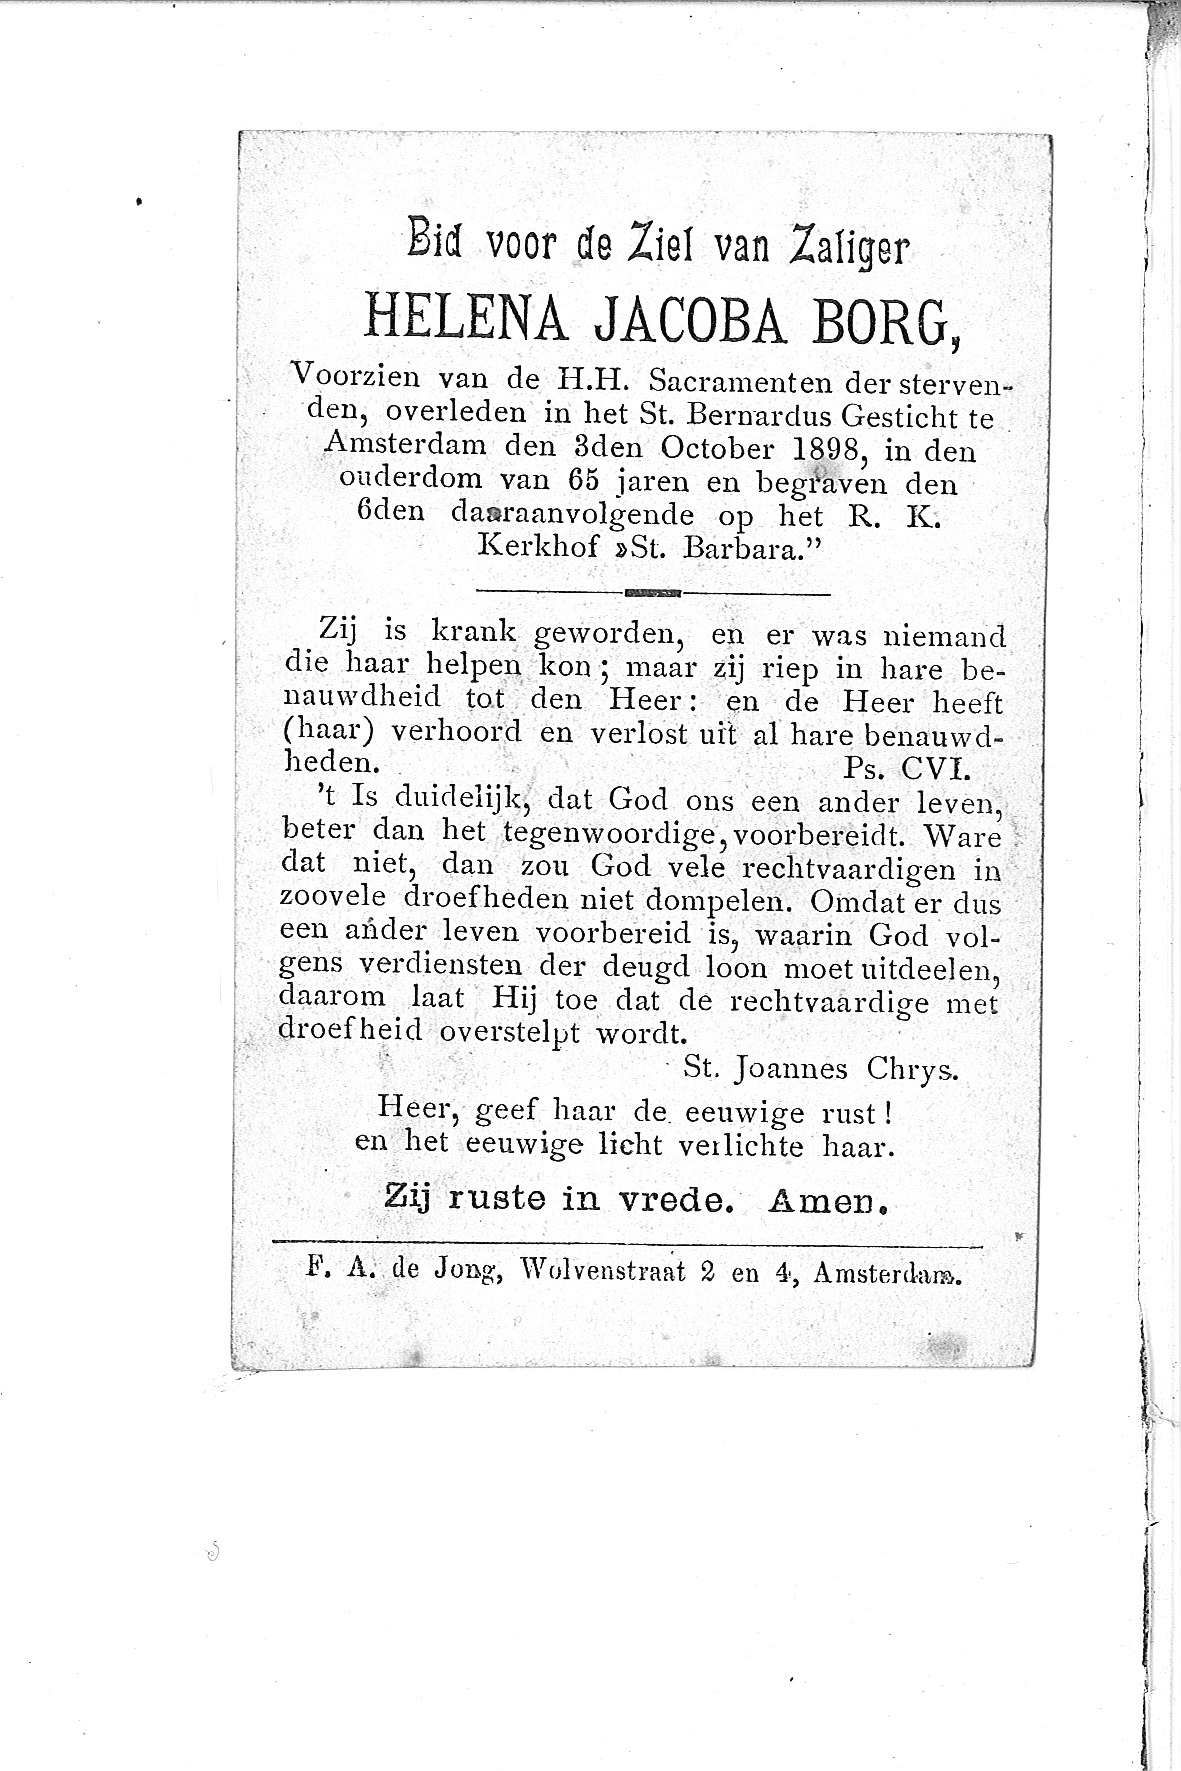 Helena Jacoba(1898)20110517105854_00022.jpg